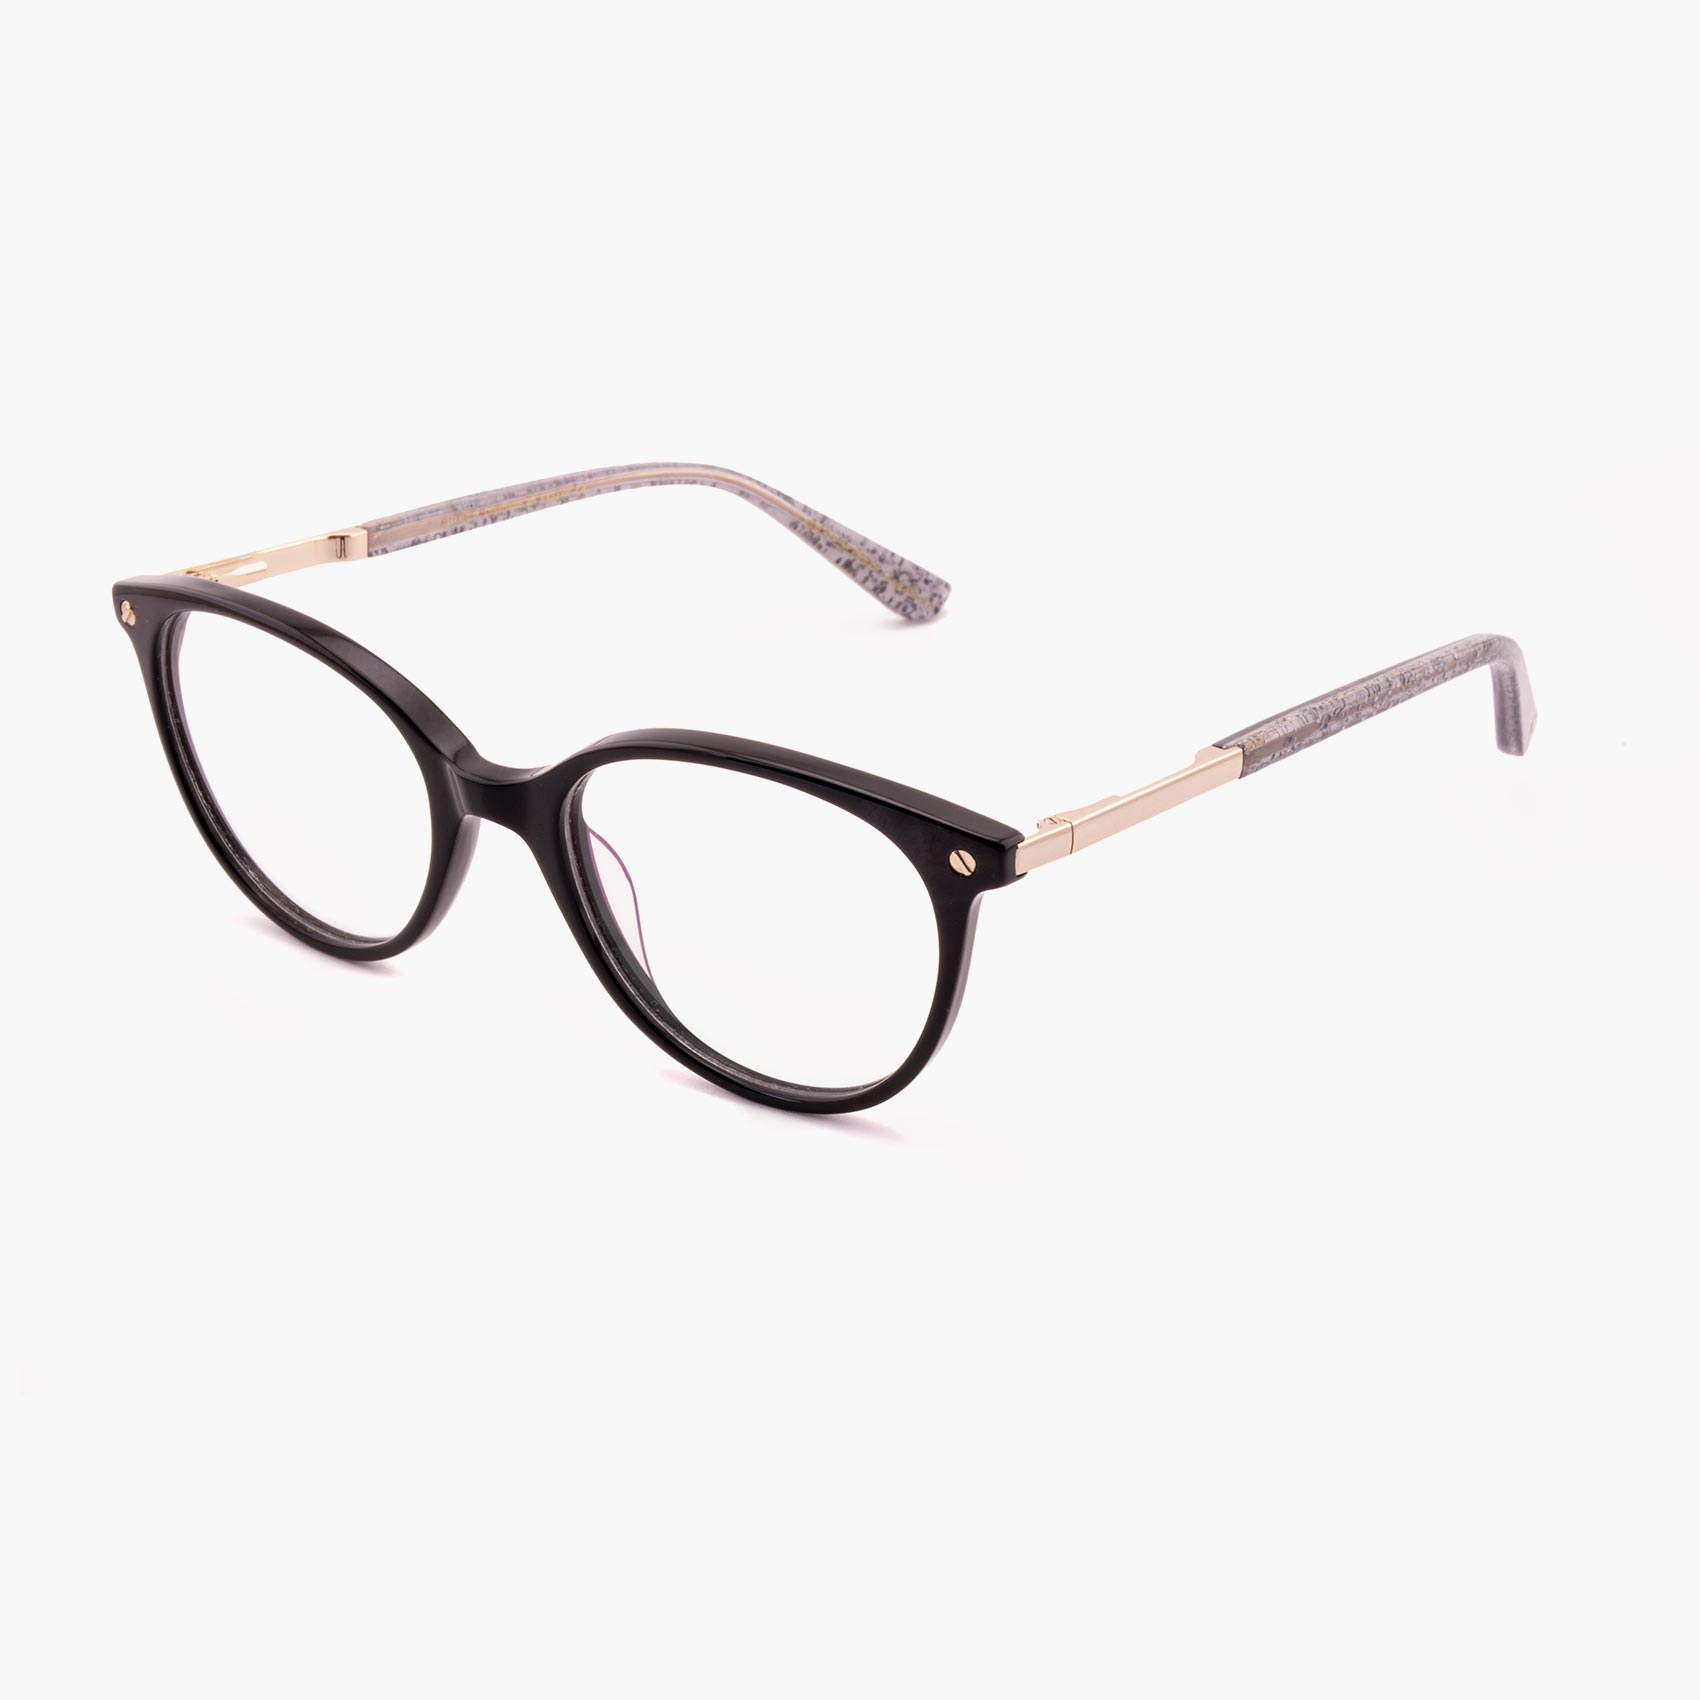 Proud eyewear Charlize C1 P gafas de vista mujer negras